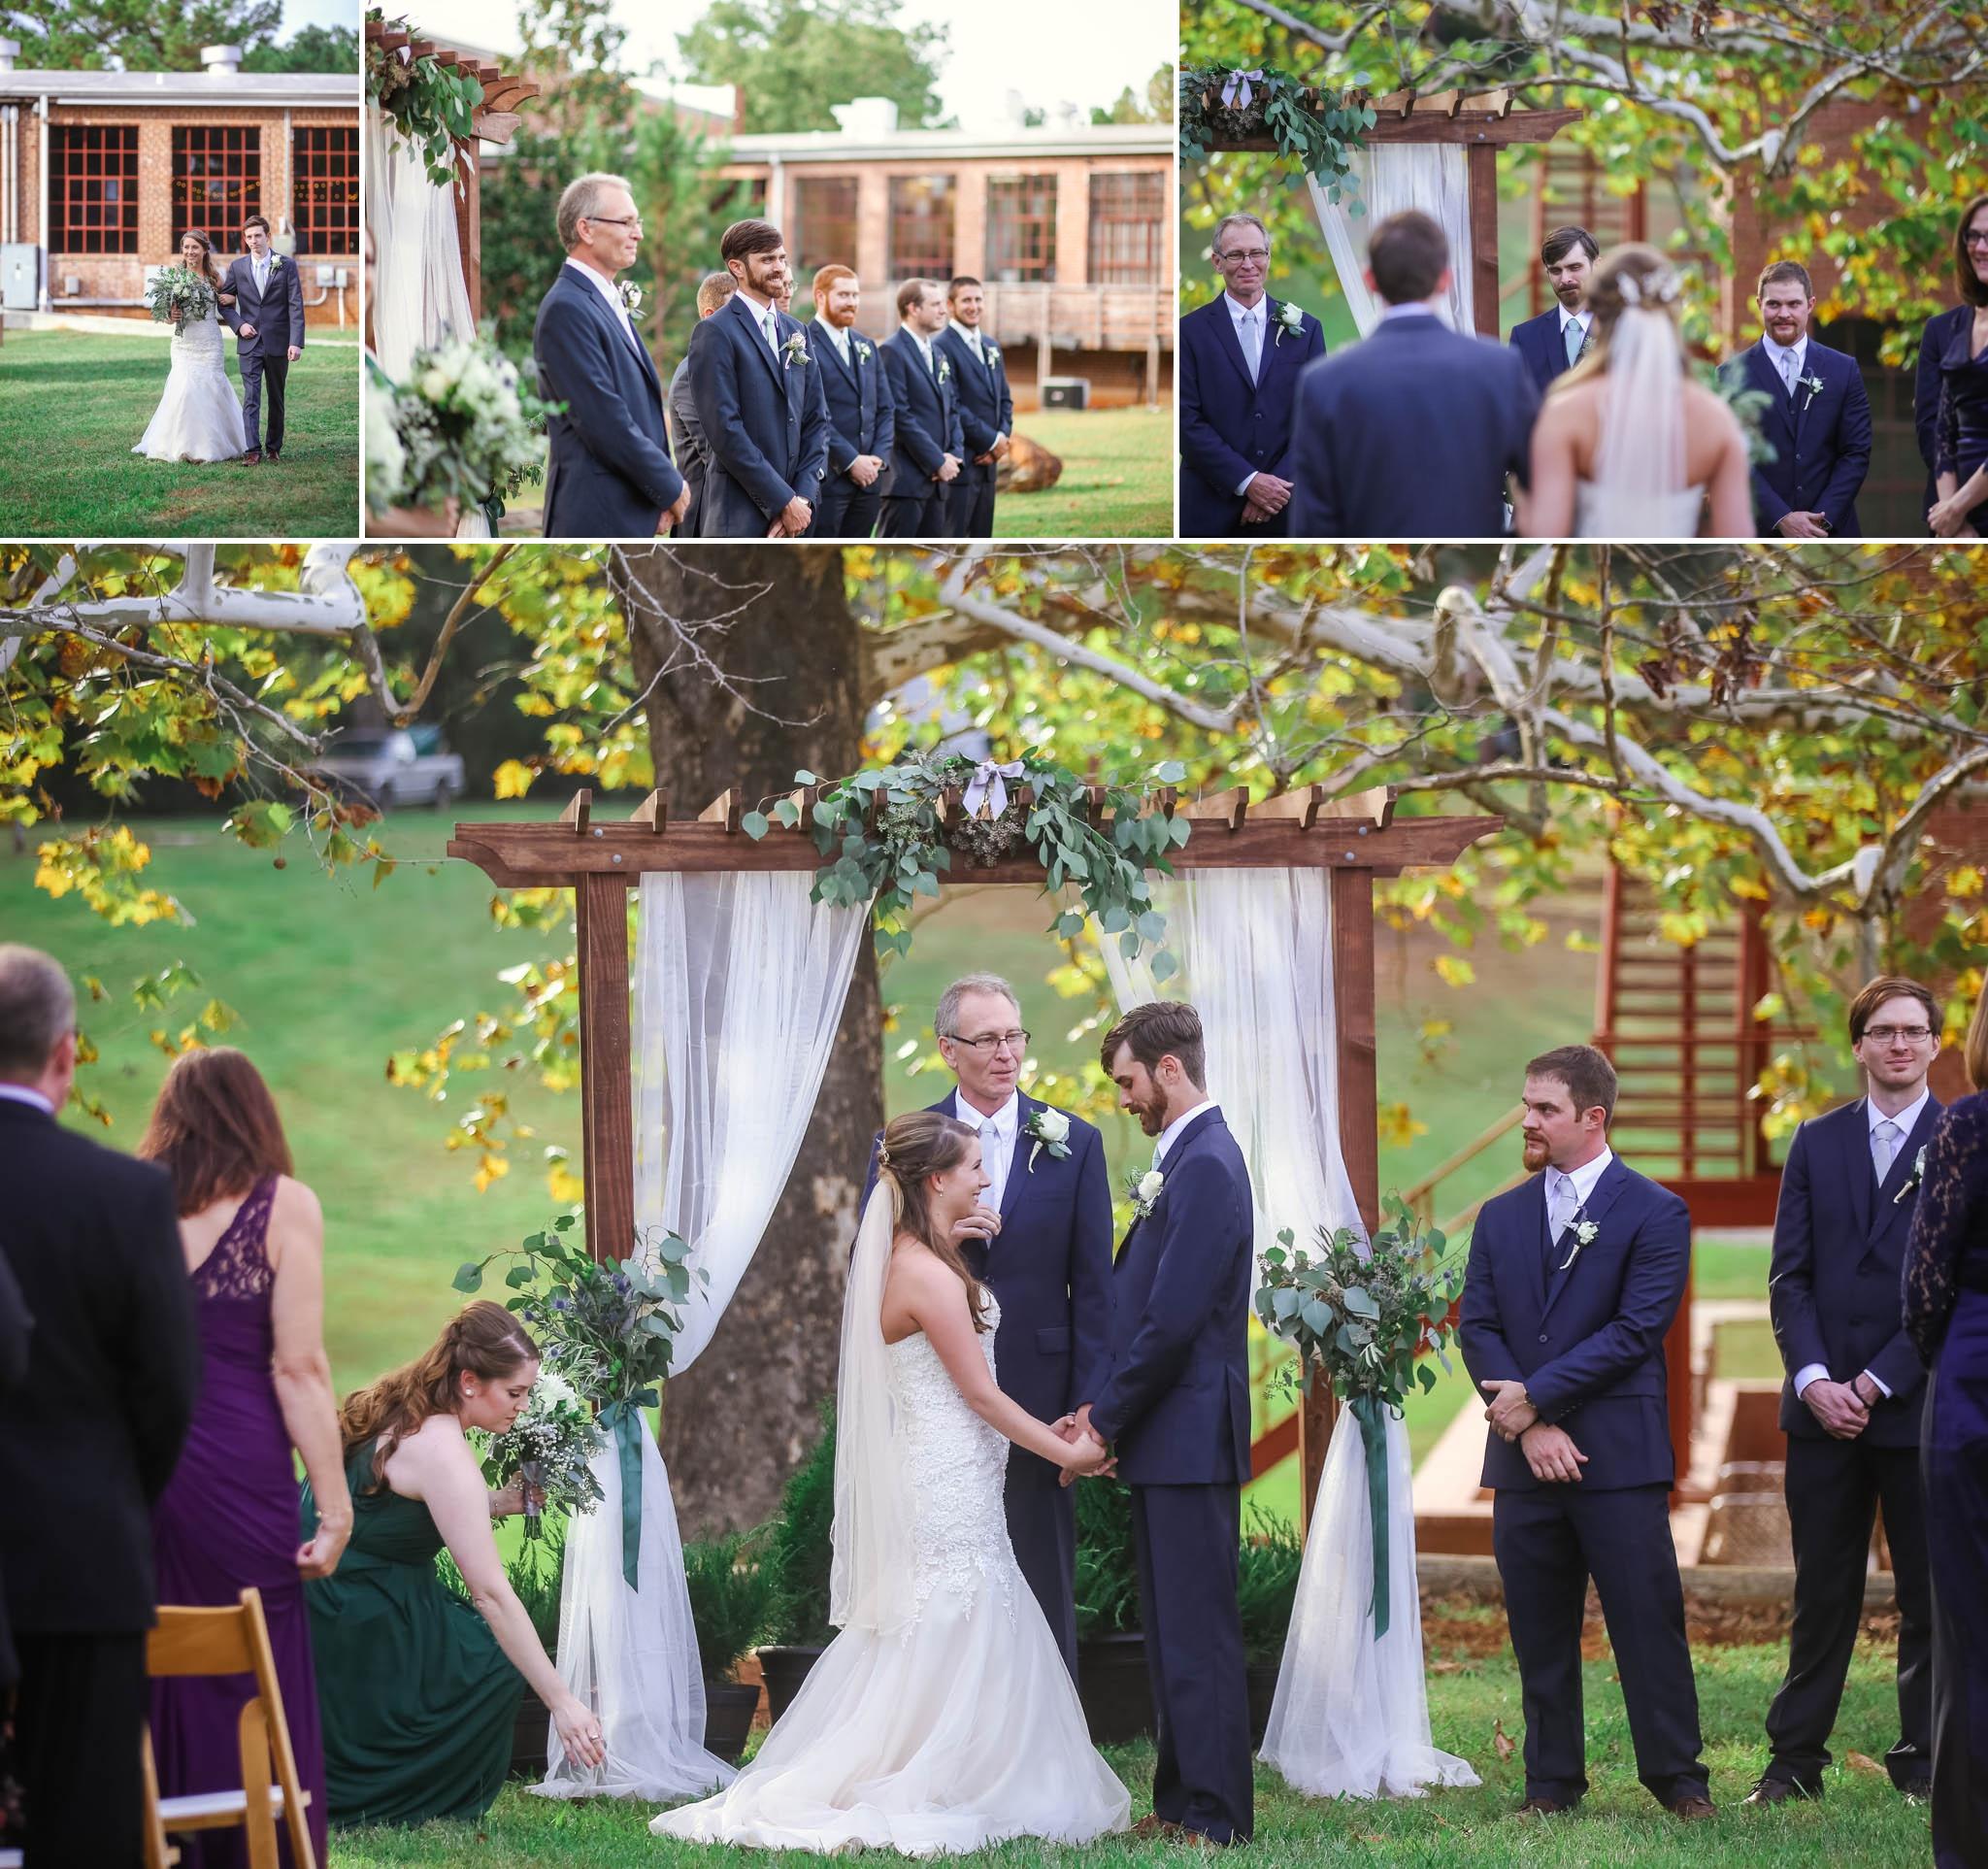 Ceremony at Chatham Mills in Pittsboro North Carolina Wedding Photography - Johanna Dye - Meredith and Brandon